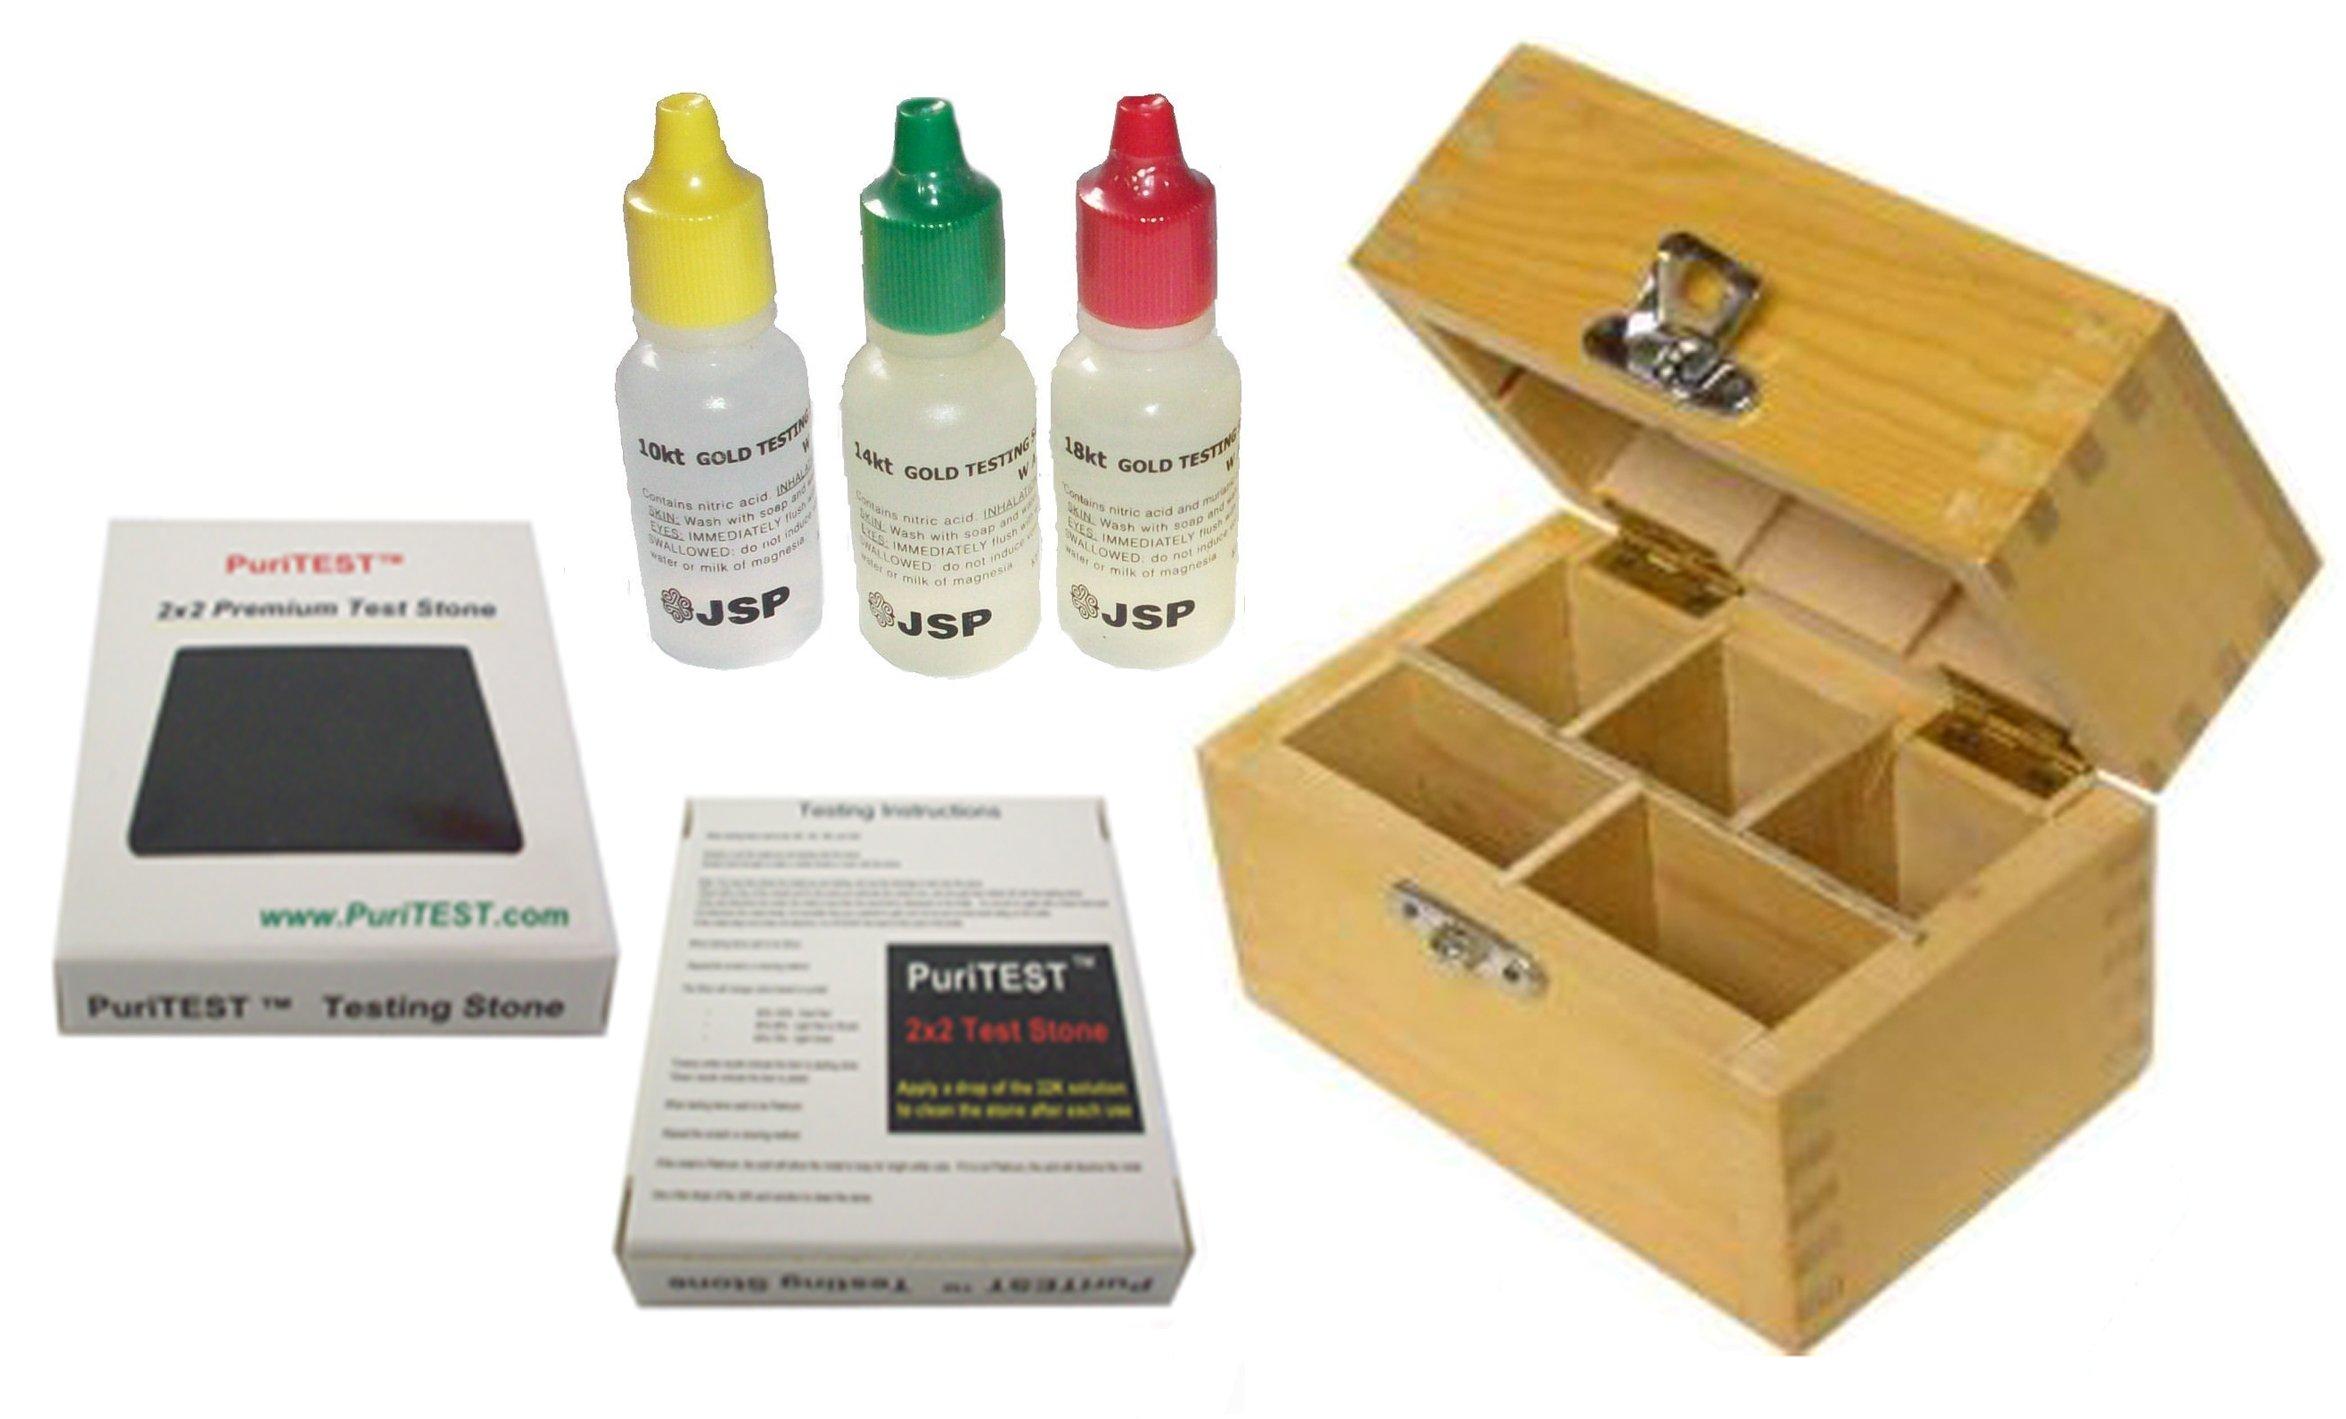 JSP 10k/14k/18k Gold Test Acid Solutions Tester Kit Detect Metals Scrap Jewelry + Wooden Box + PRO 2x2'' Testing Stone